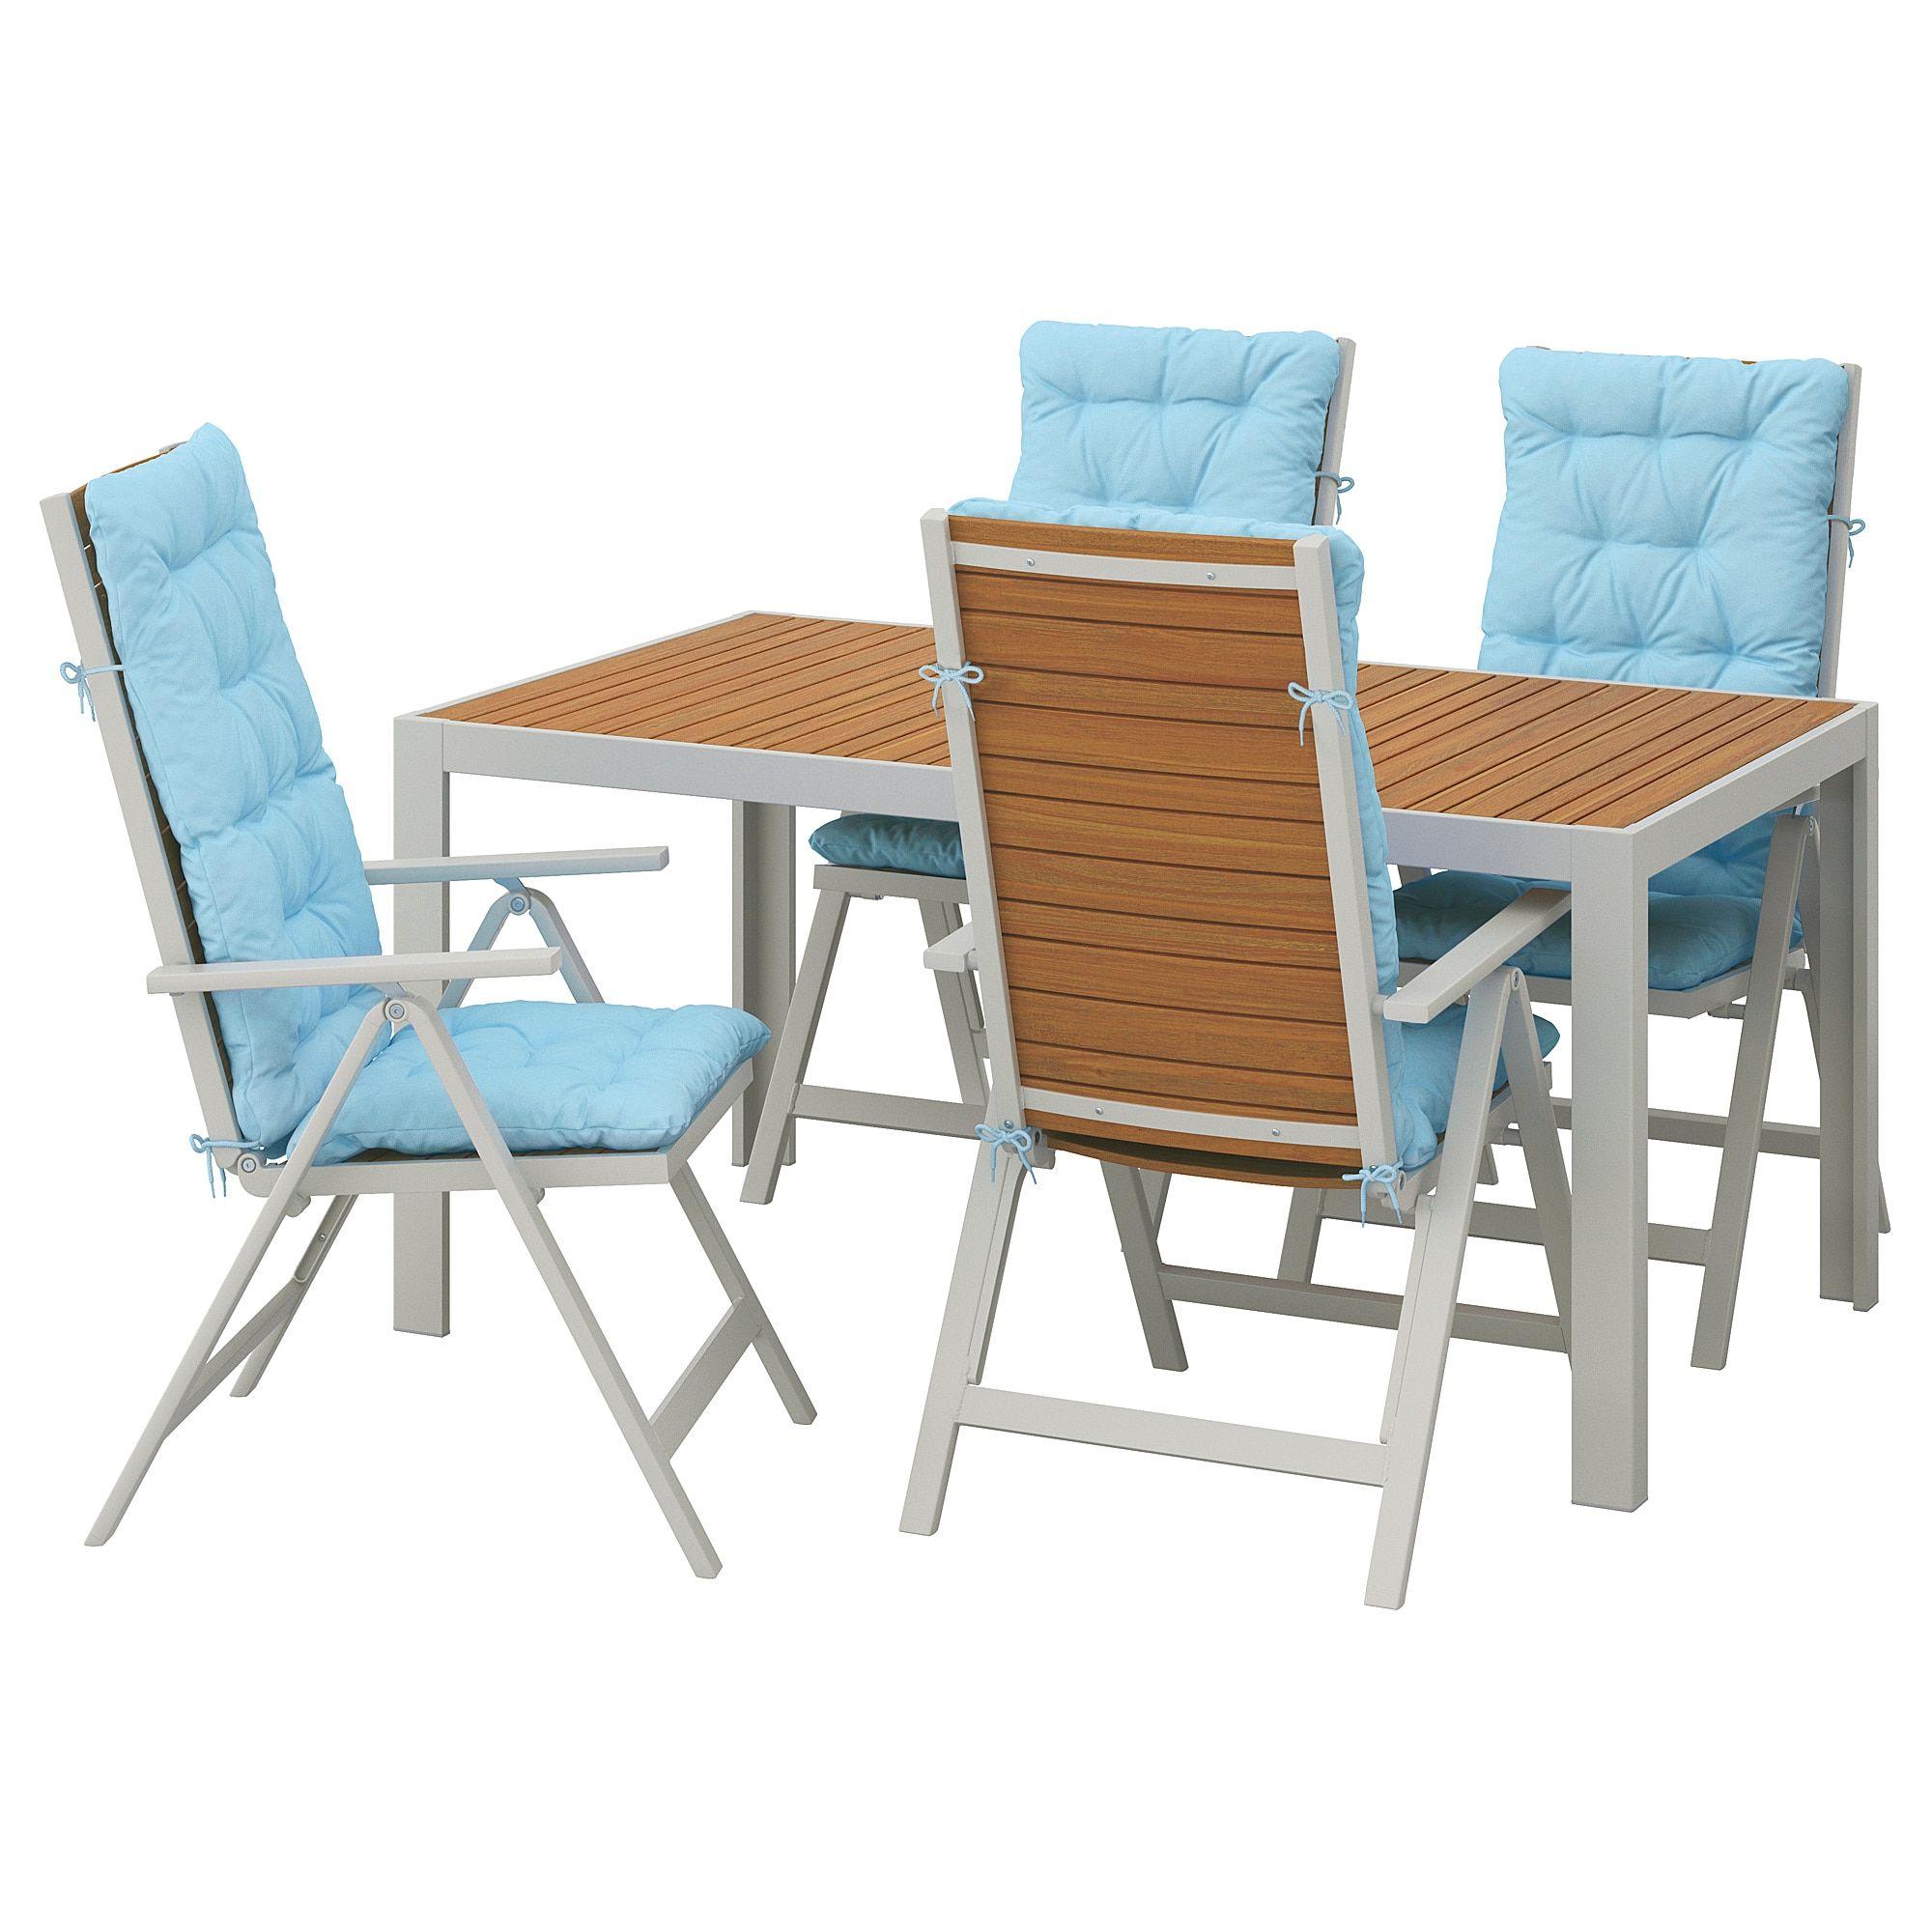 Pleasing Ikea Sjalland Light Brown Kuddarna Light Blue Table 4 Unemploymentrelief Wooden Chair Designs For Living Room Unemploymentrelieforg